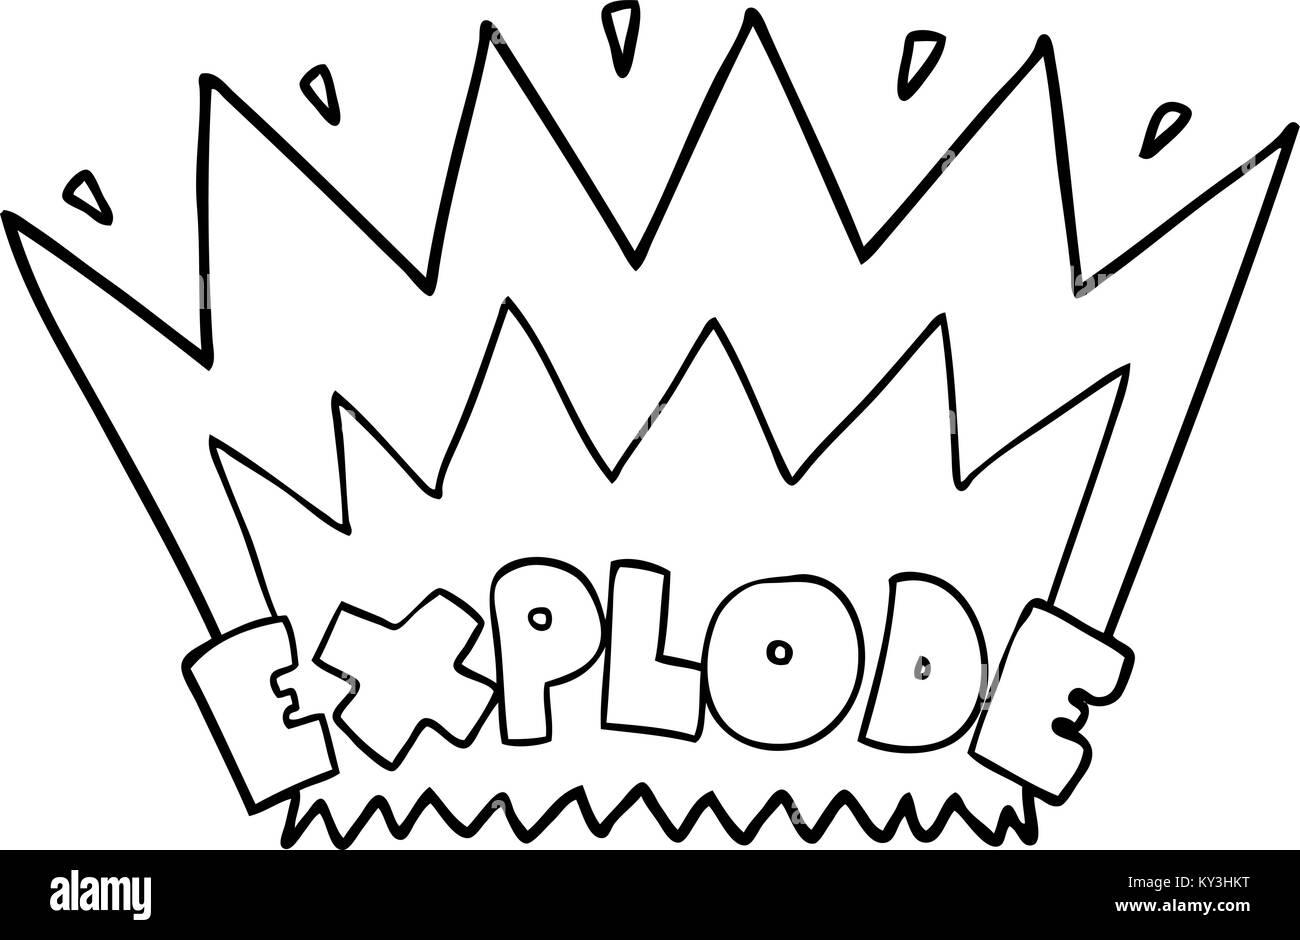 Cartoon explosion symbol stock photos cartoon explosion symbol cartoon explosion stock image buycottarizona